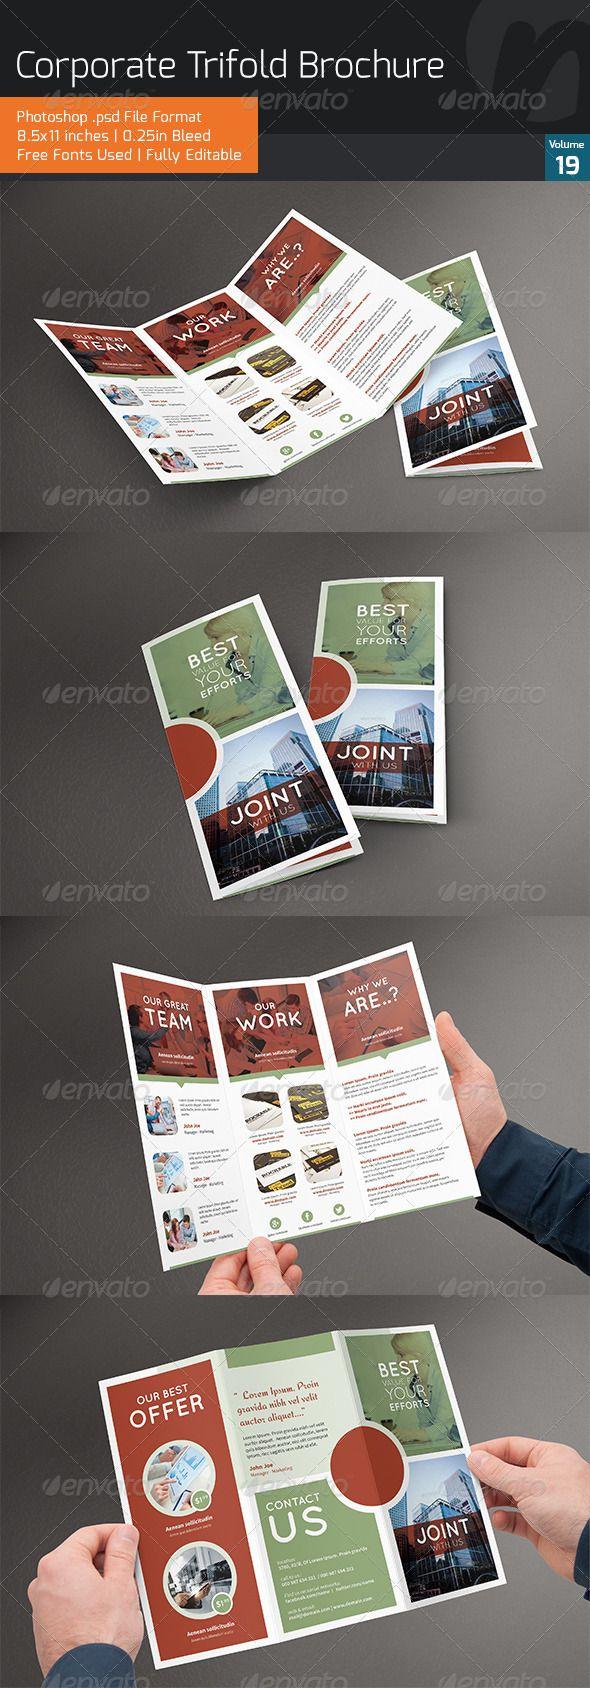 Corporate Trifold Brochure V19